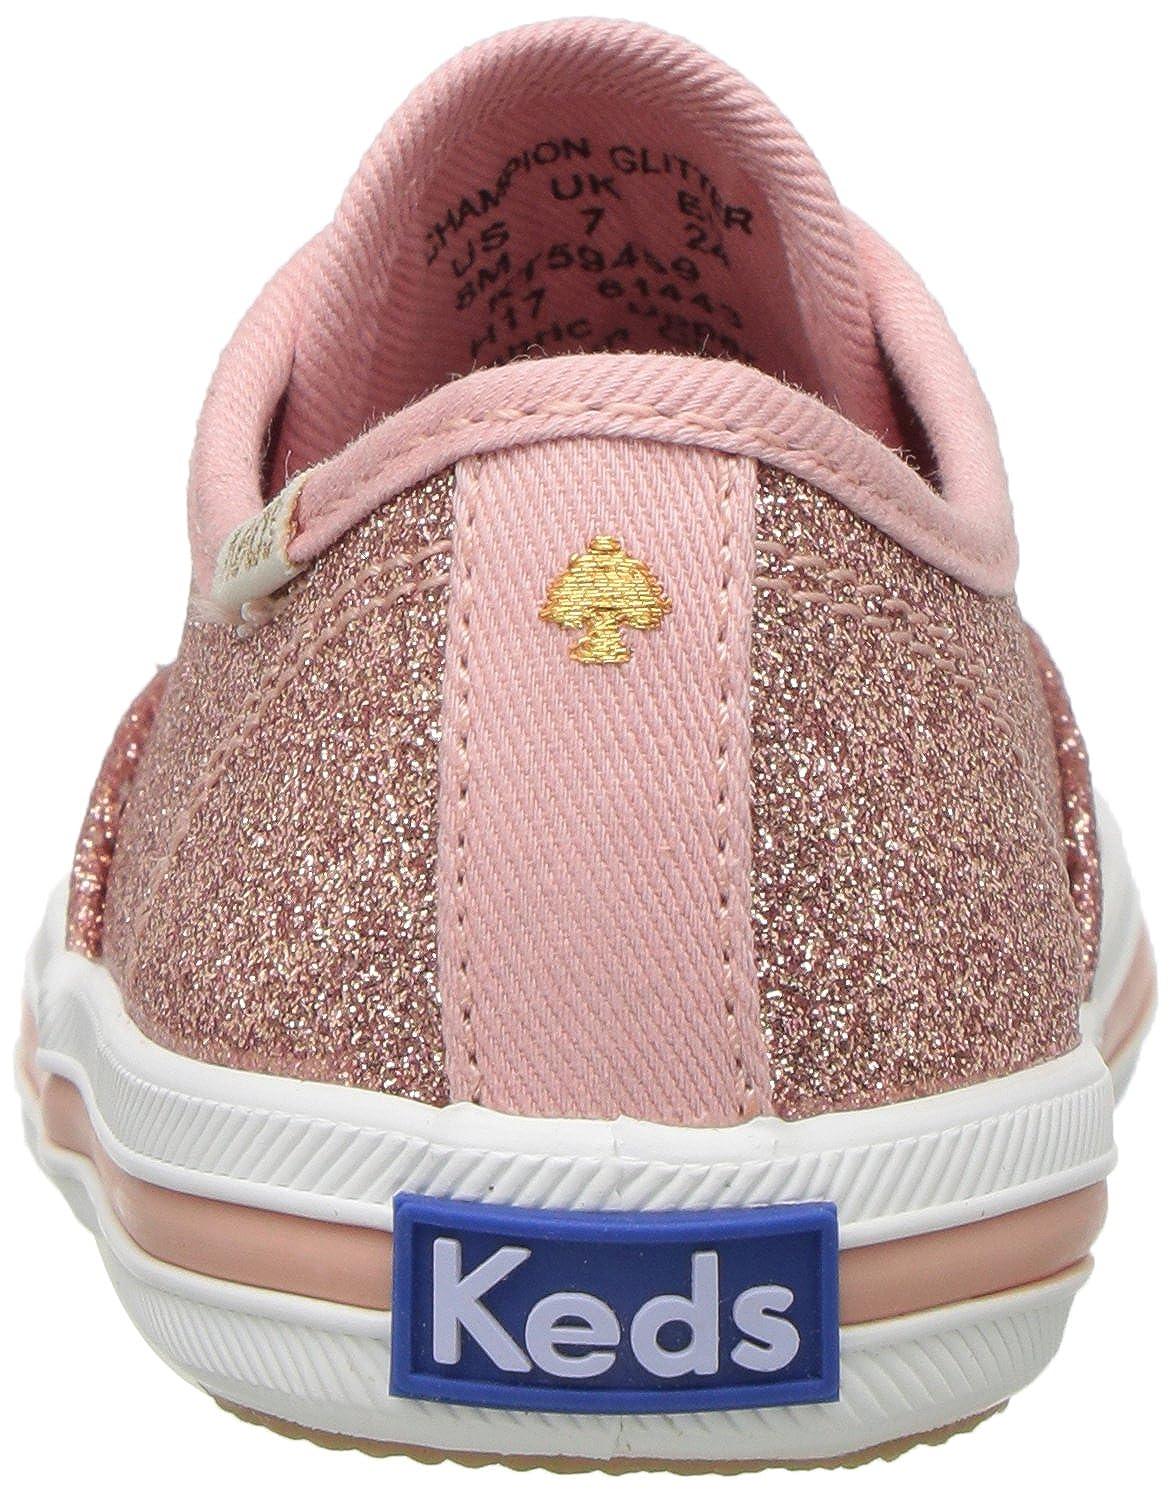 Keds Kids Champion Glitter